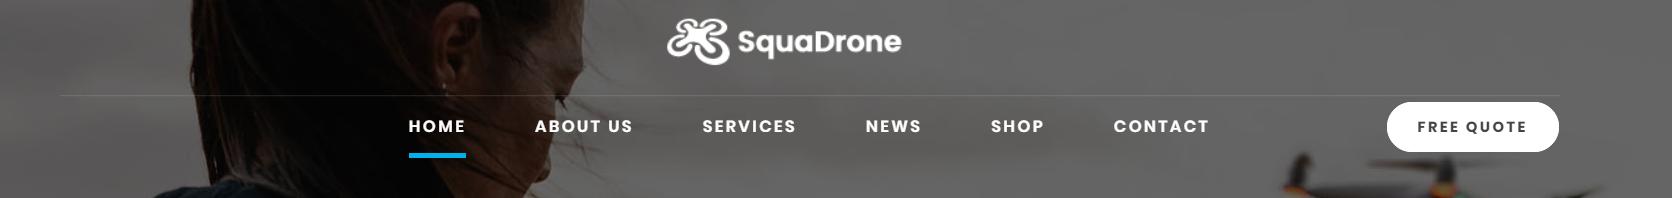 https://documentation.bold-themes.com/squadrone/wp-content/uploads/sites/29/2018/02/menu-below-center.png